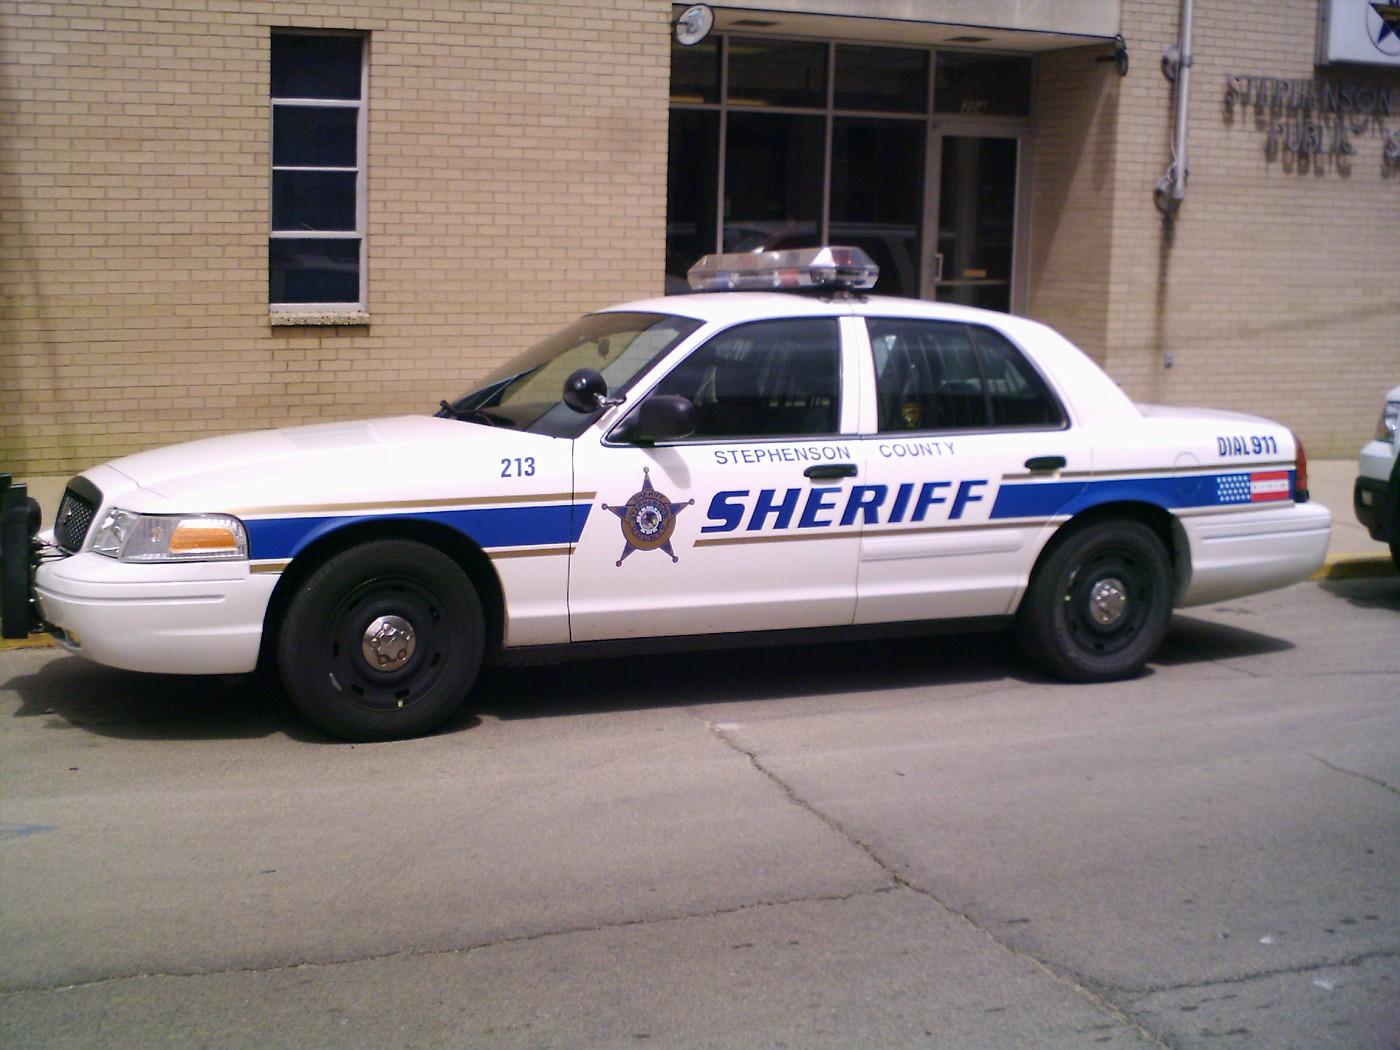 IL - Stevenson County Sheriff